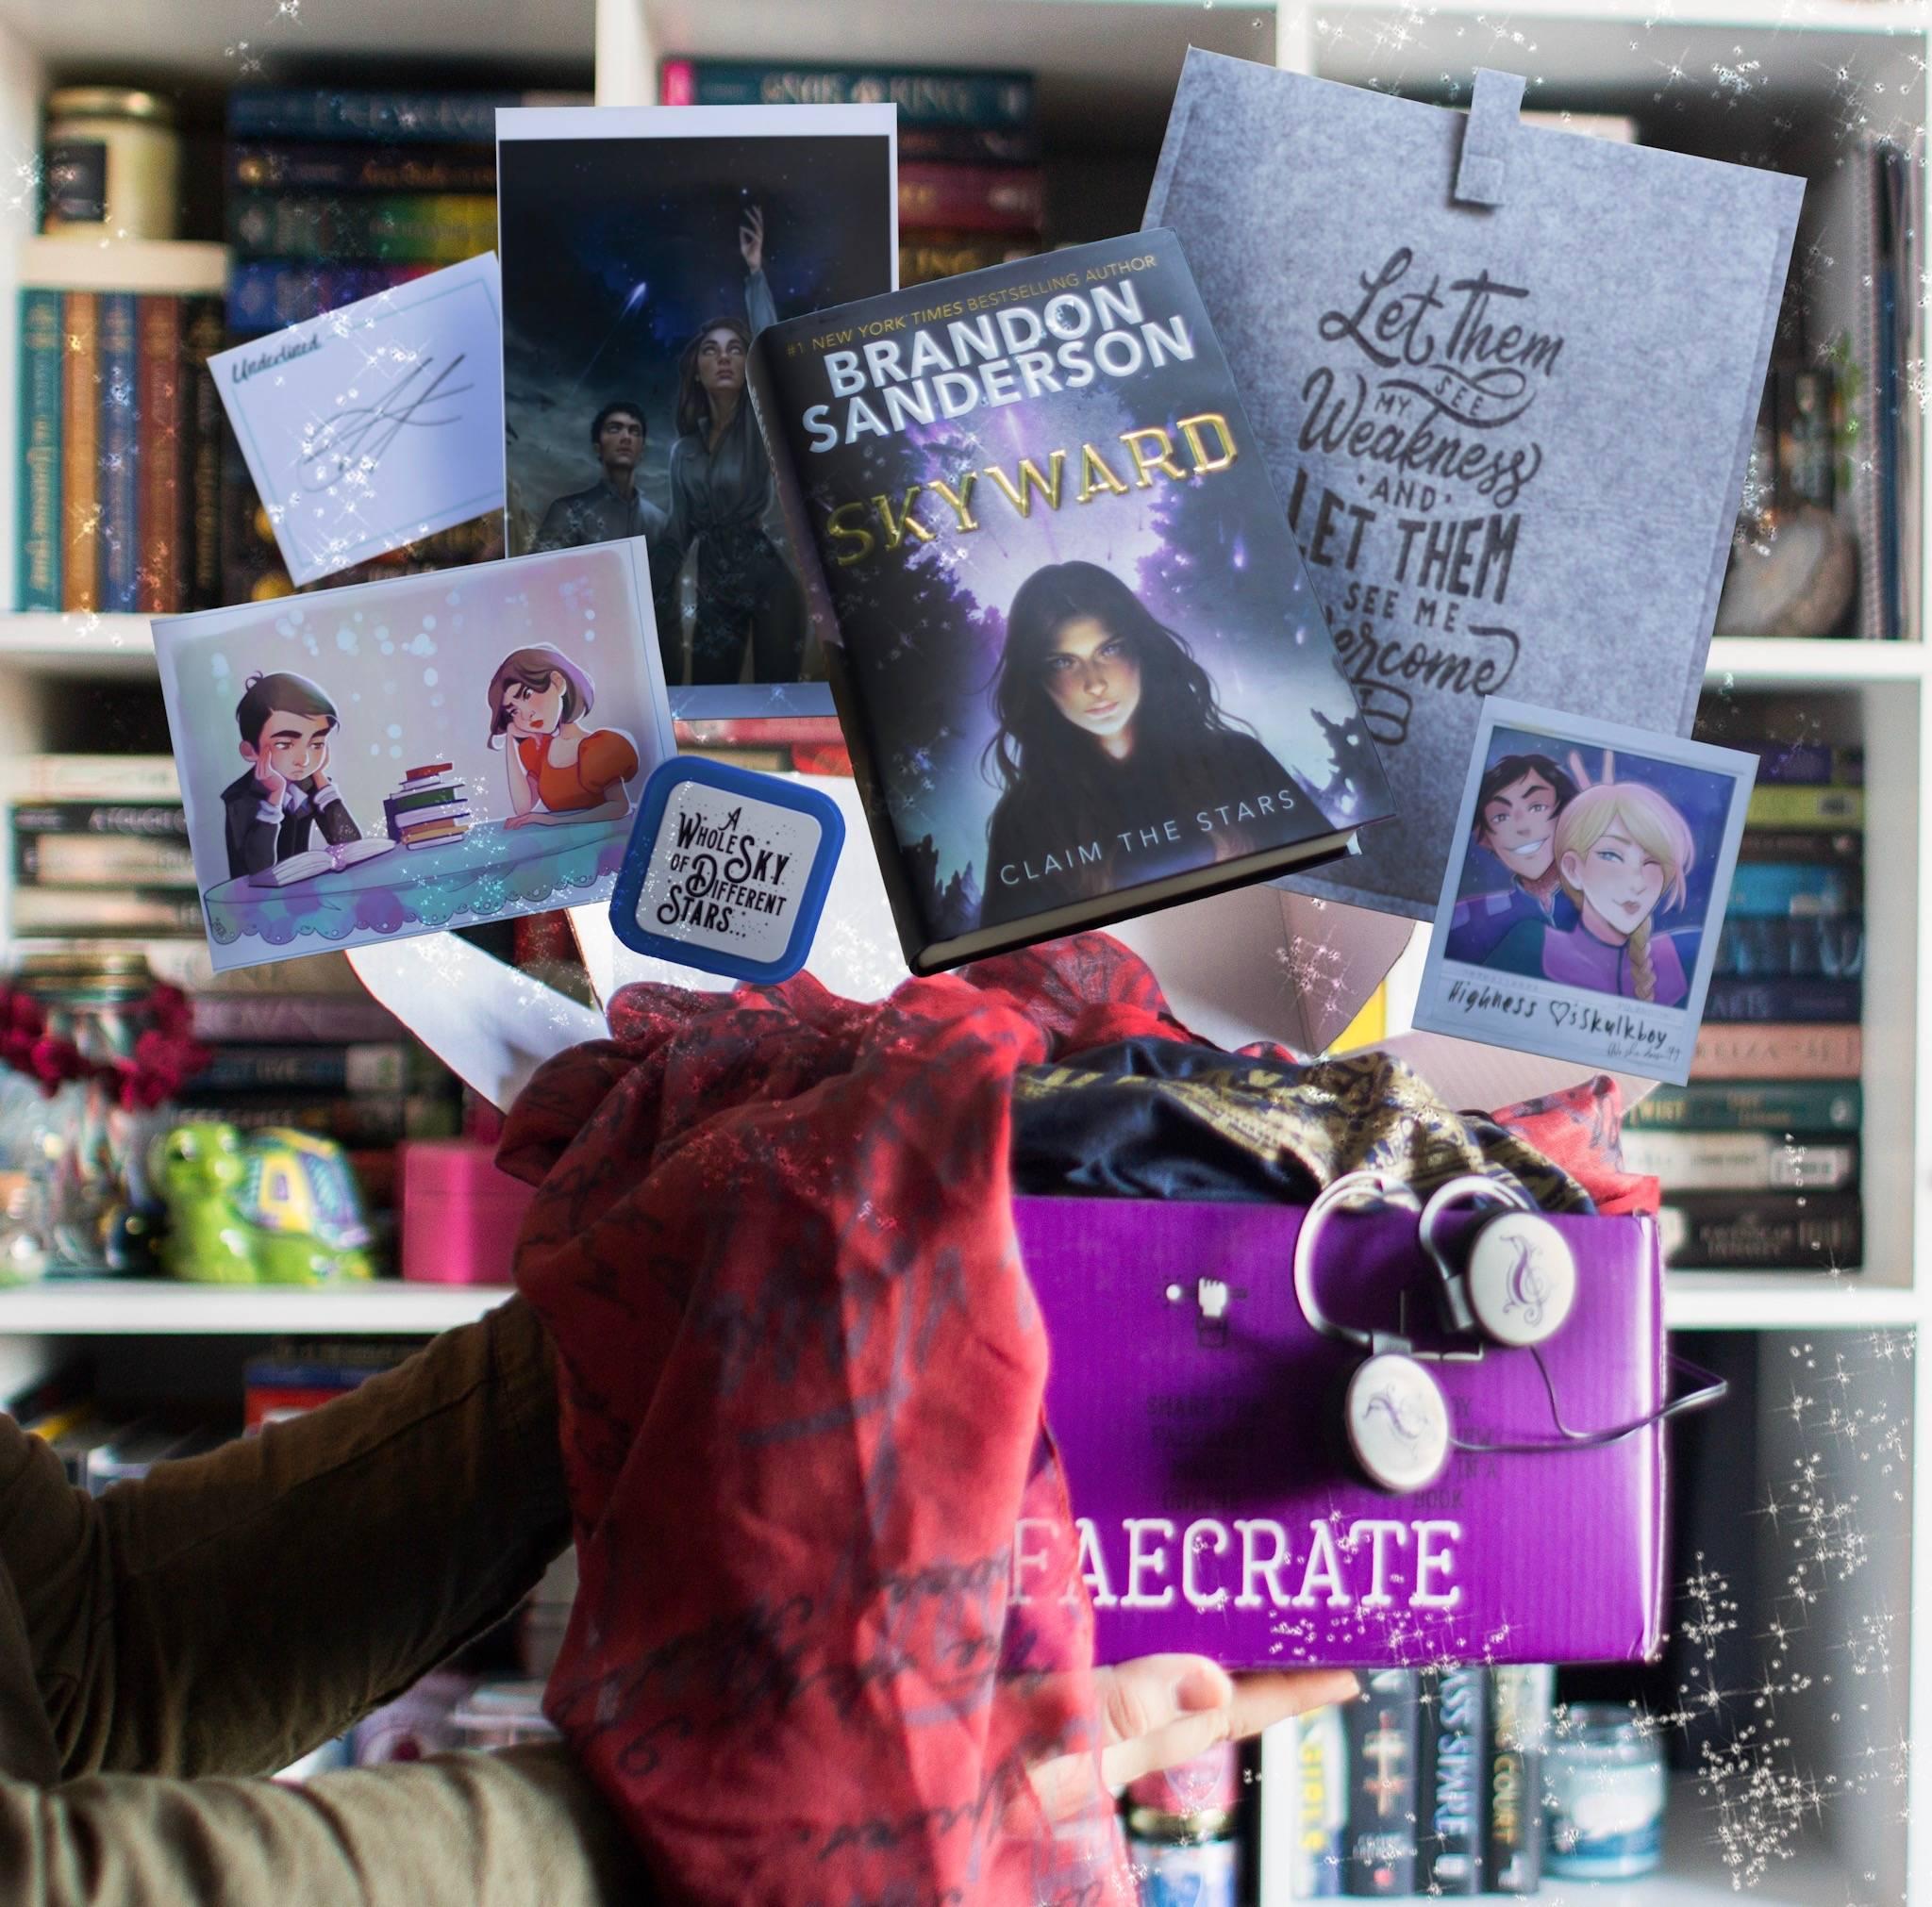 November 2018 Stargazers box theme included Mistborn Felt Booksleeve, Skyward by Brandon Sanderson, Mistborn Vin & Elend Art, Skyward Art Print and Vertical Pillow Case, Skyward Pilot's Pin, The Queen's Rising Headphones, The Wrath and Dawn Scarf, Illuminae Collectors Polaroid, Illuminae Night Light, Strange the Dreamer Shirt included in Seelie and Solitary Fae boxes only.